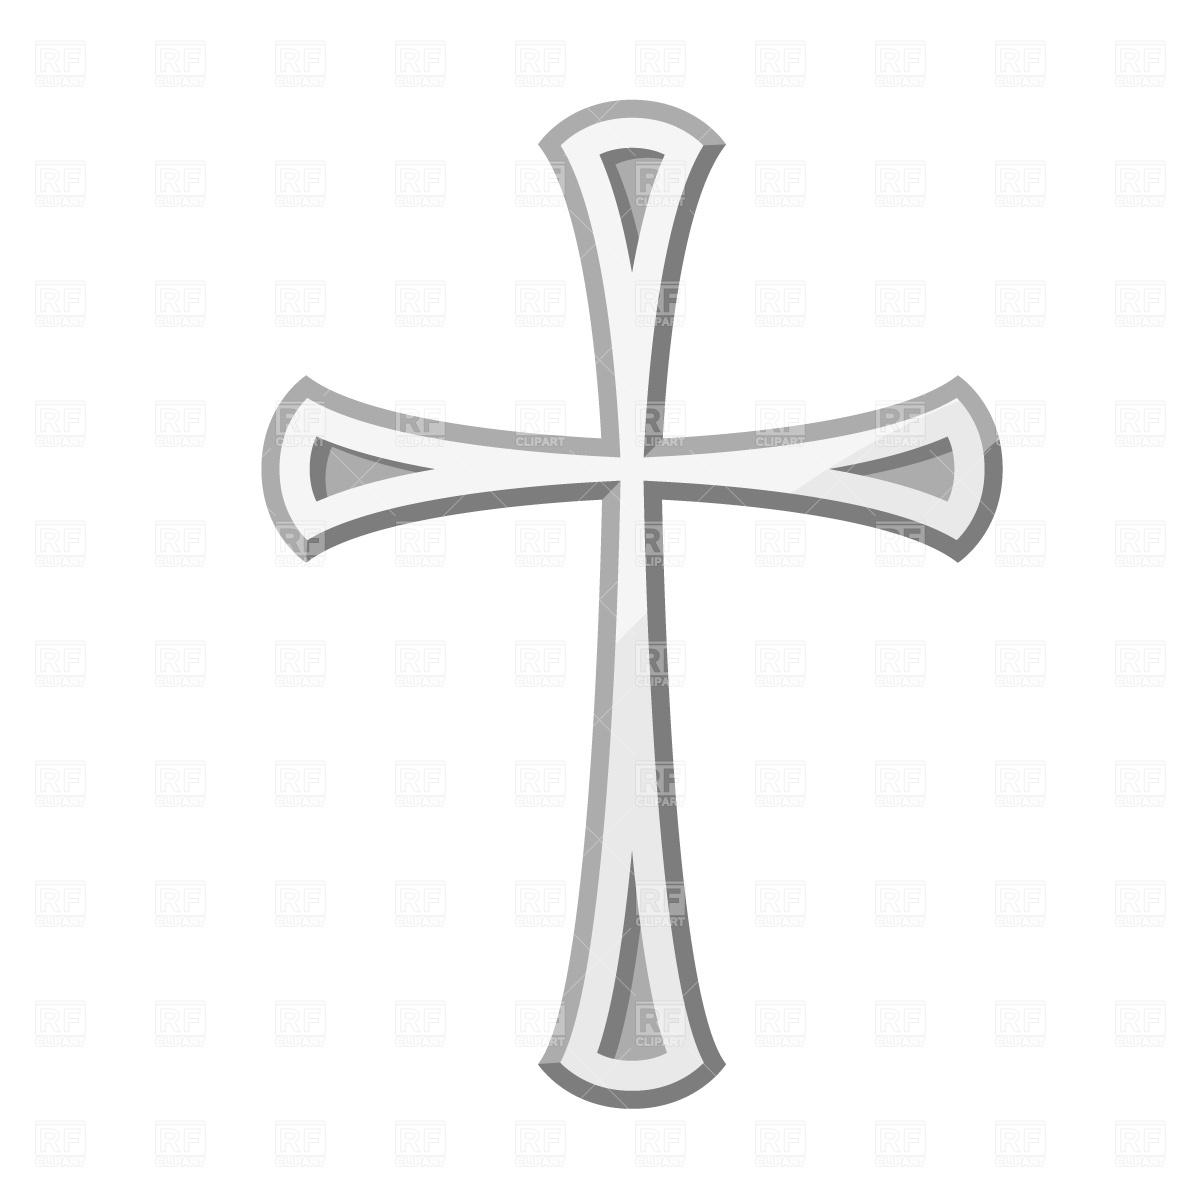 16 Free Vector Art Cross Images